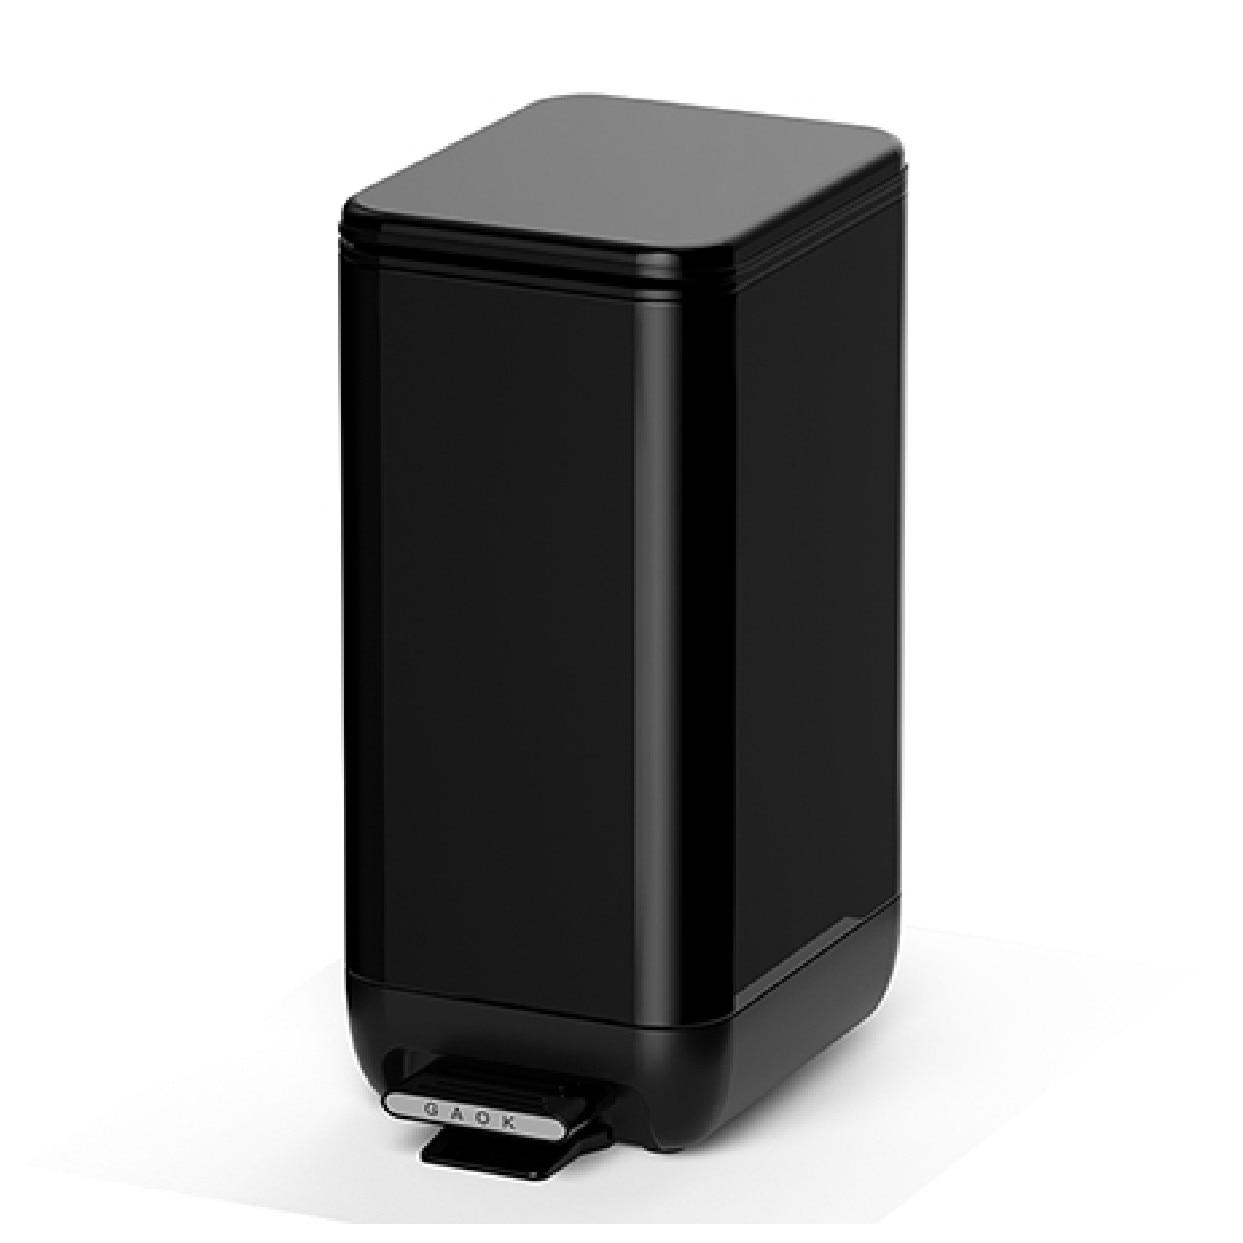 Ins Pedal Trash Bin With Lid Bathroom Dustbin Household Toilet Narrow Seam Waste Bin Cleaning Tools Garbage Bucket enlarge